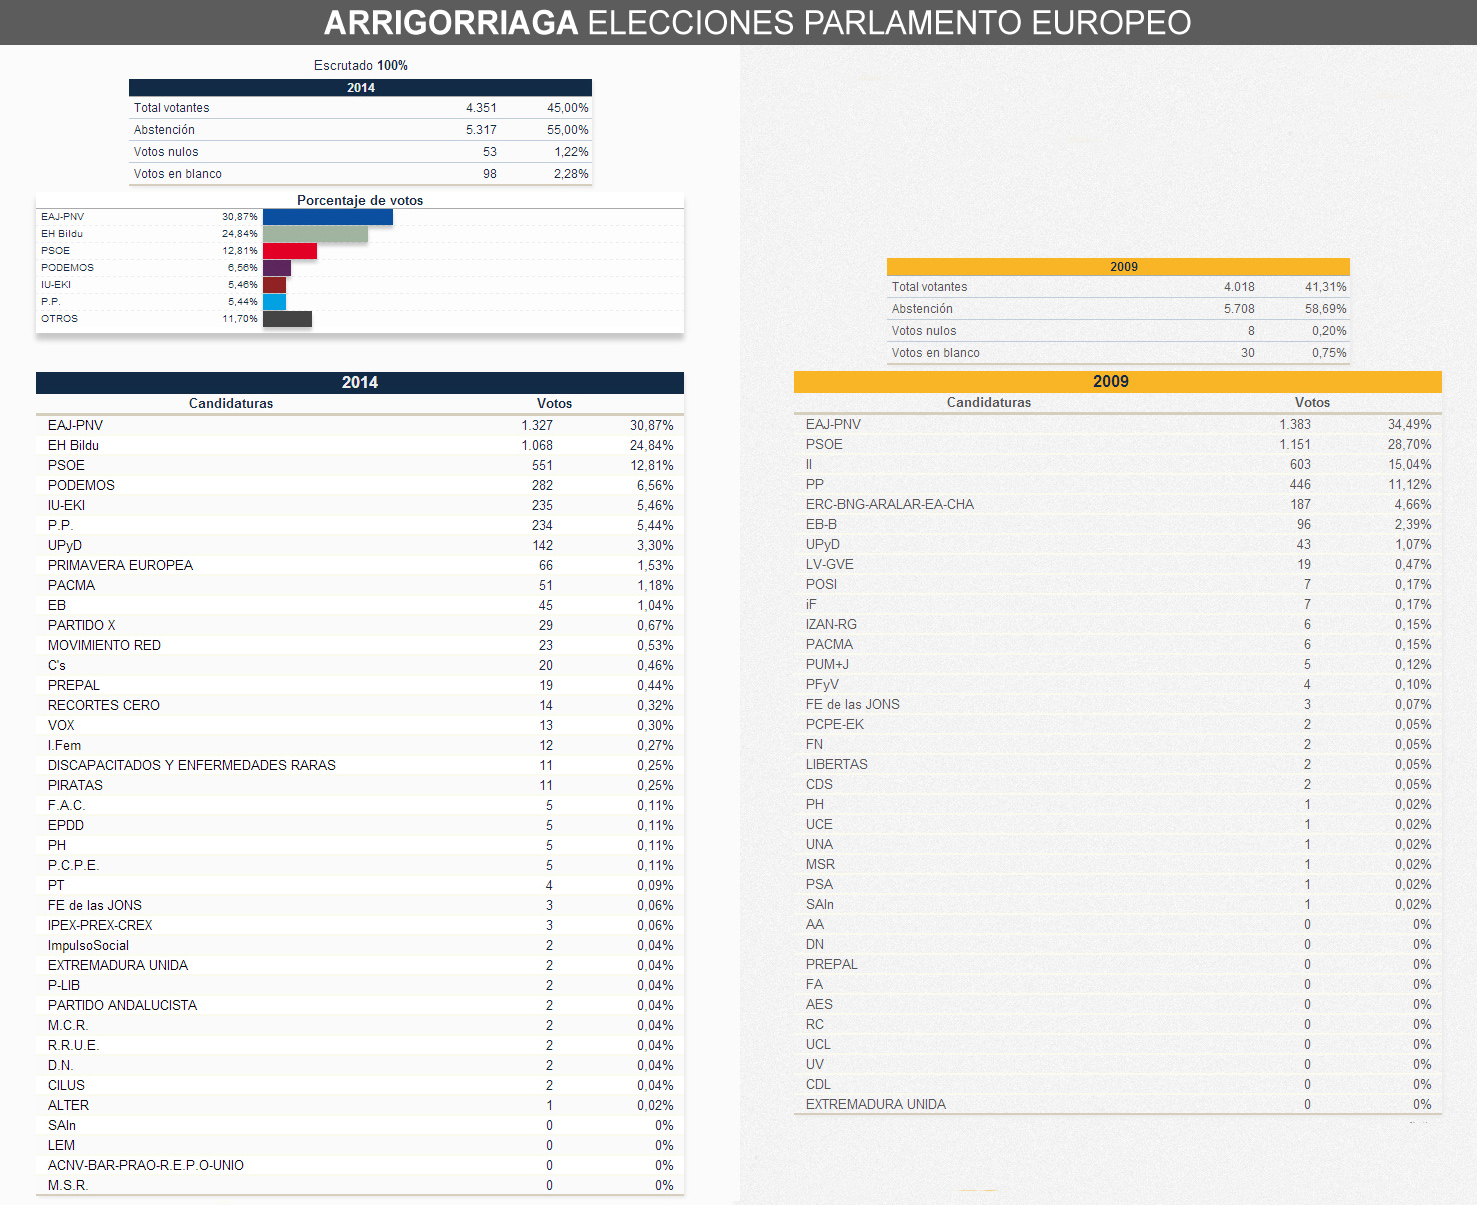 elecciones_europeas_2014_arrigorriaga_comparativa